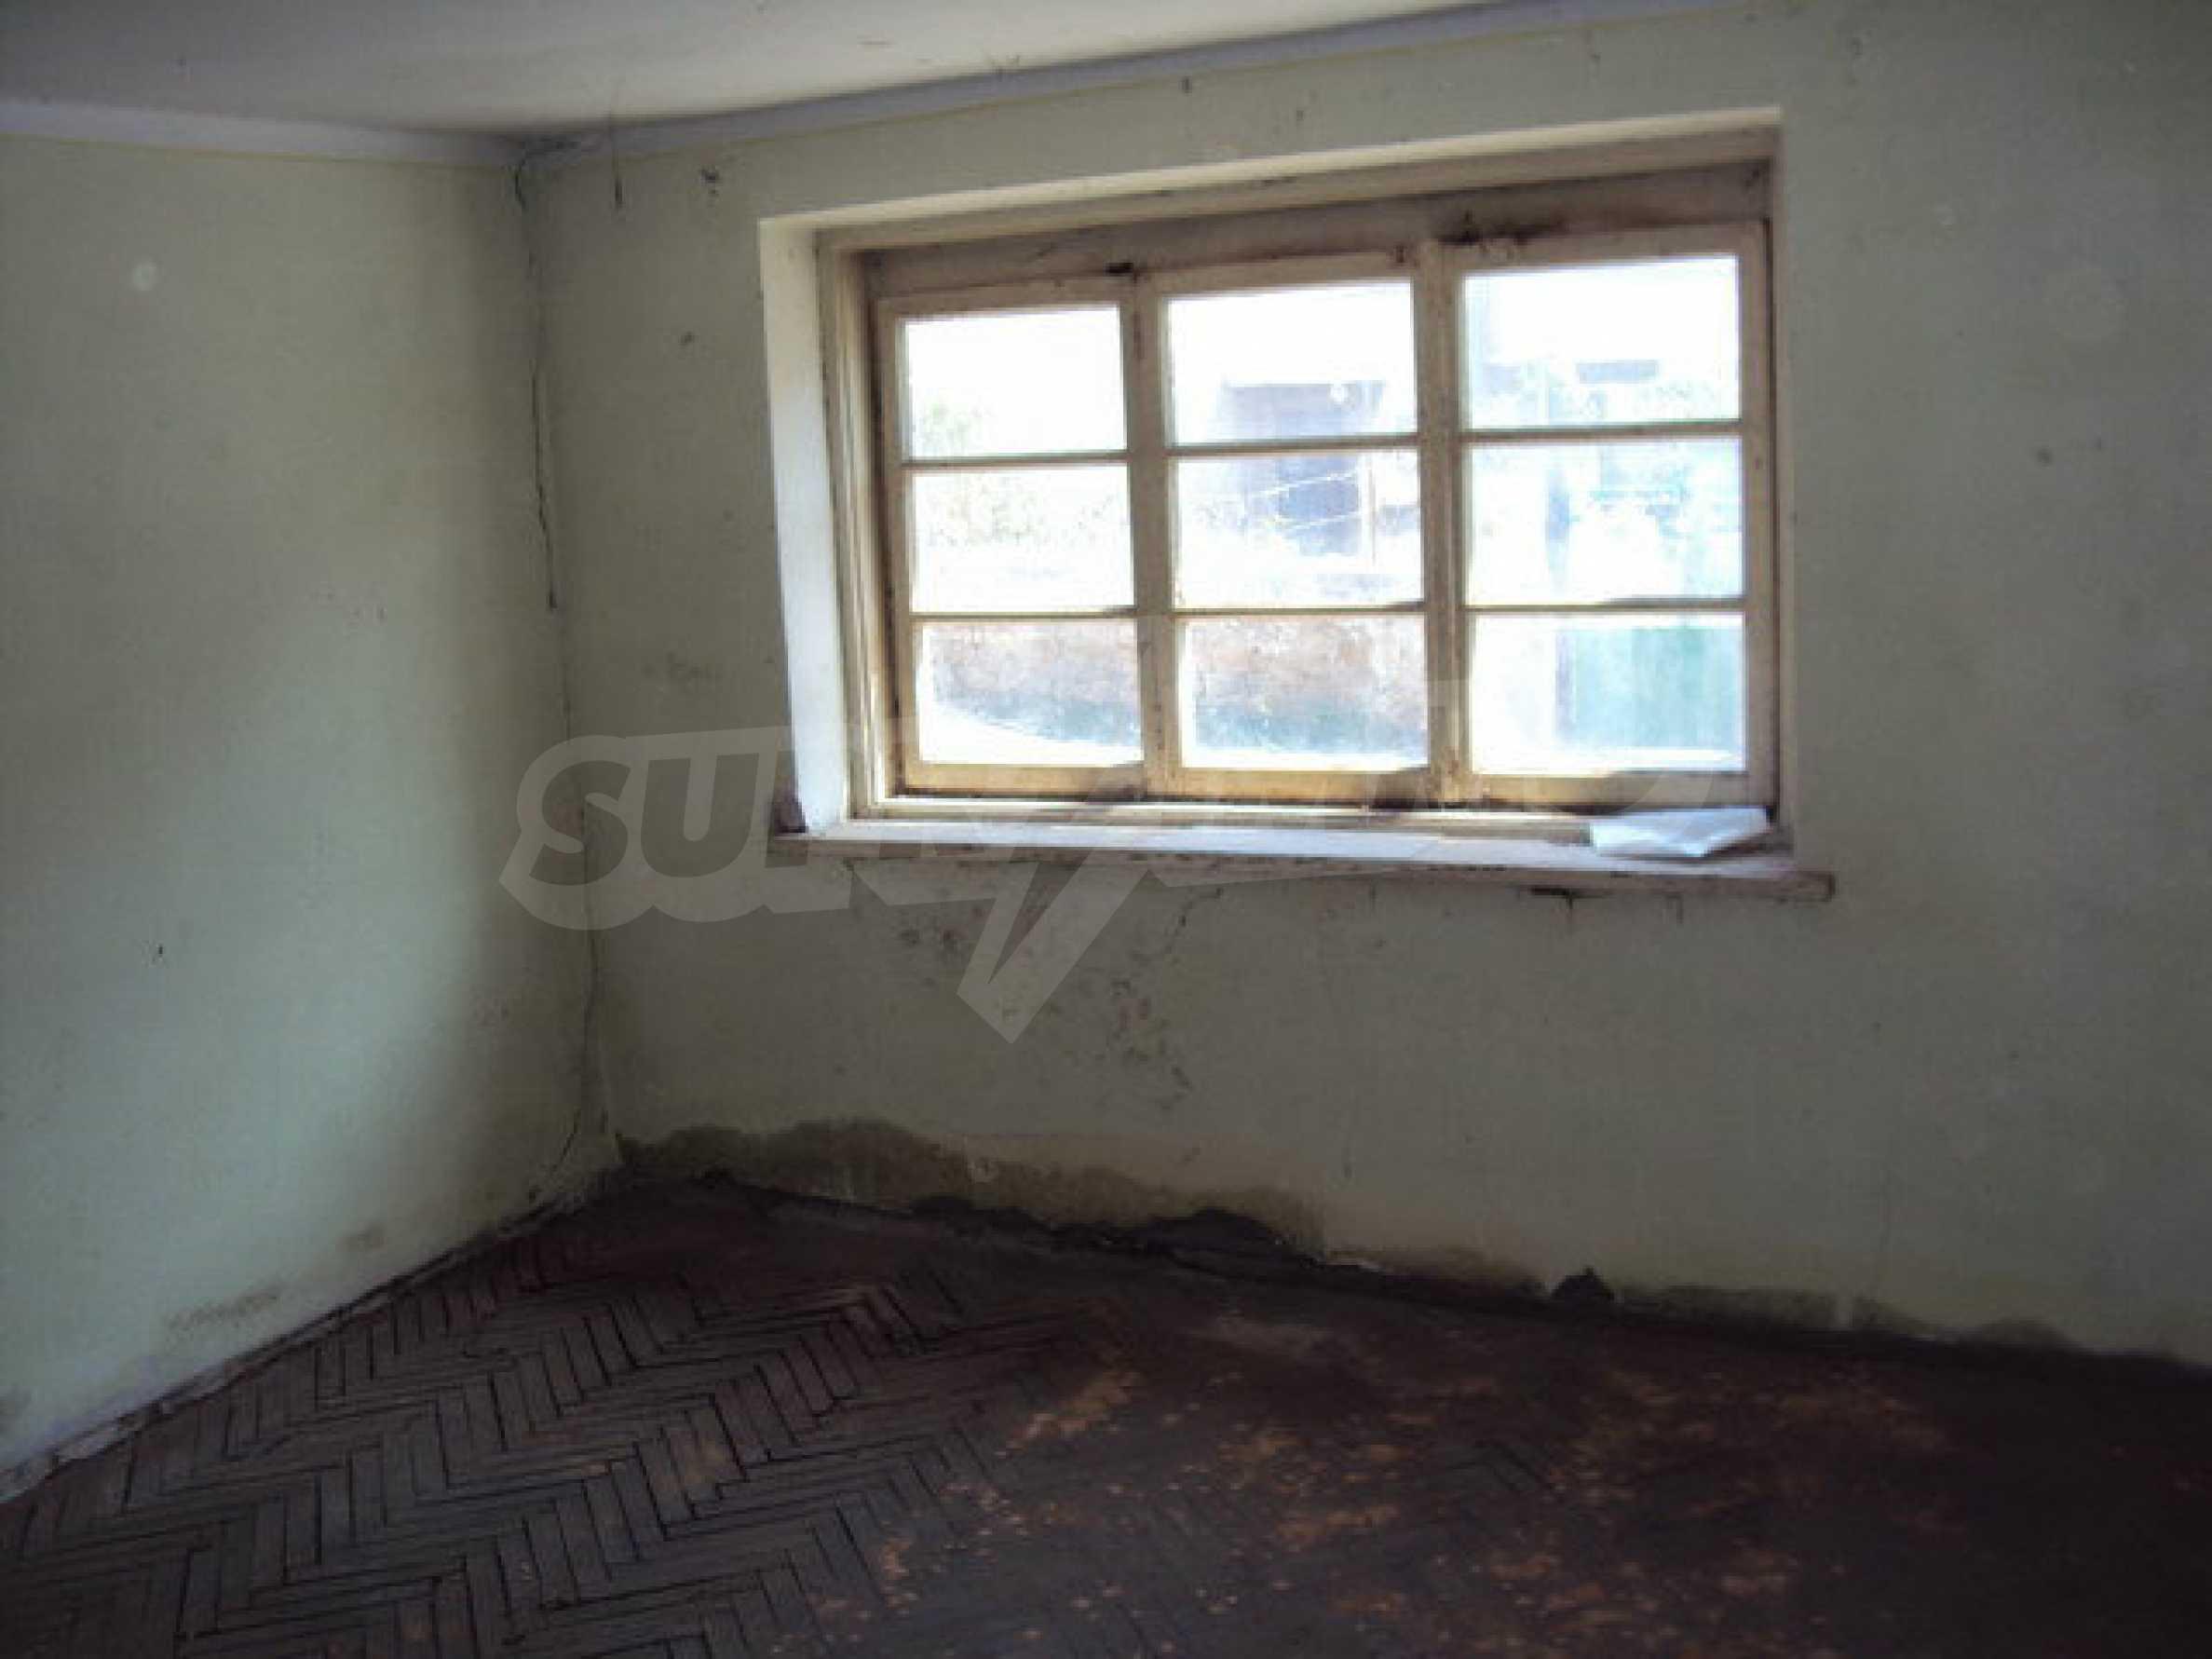 Spacious house with a yard, garage and additional building Dryanovo 25